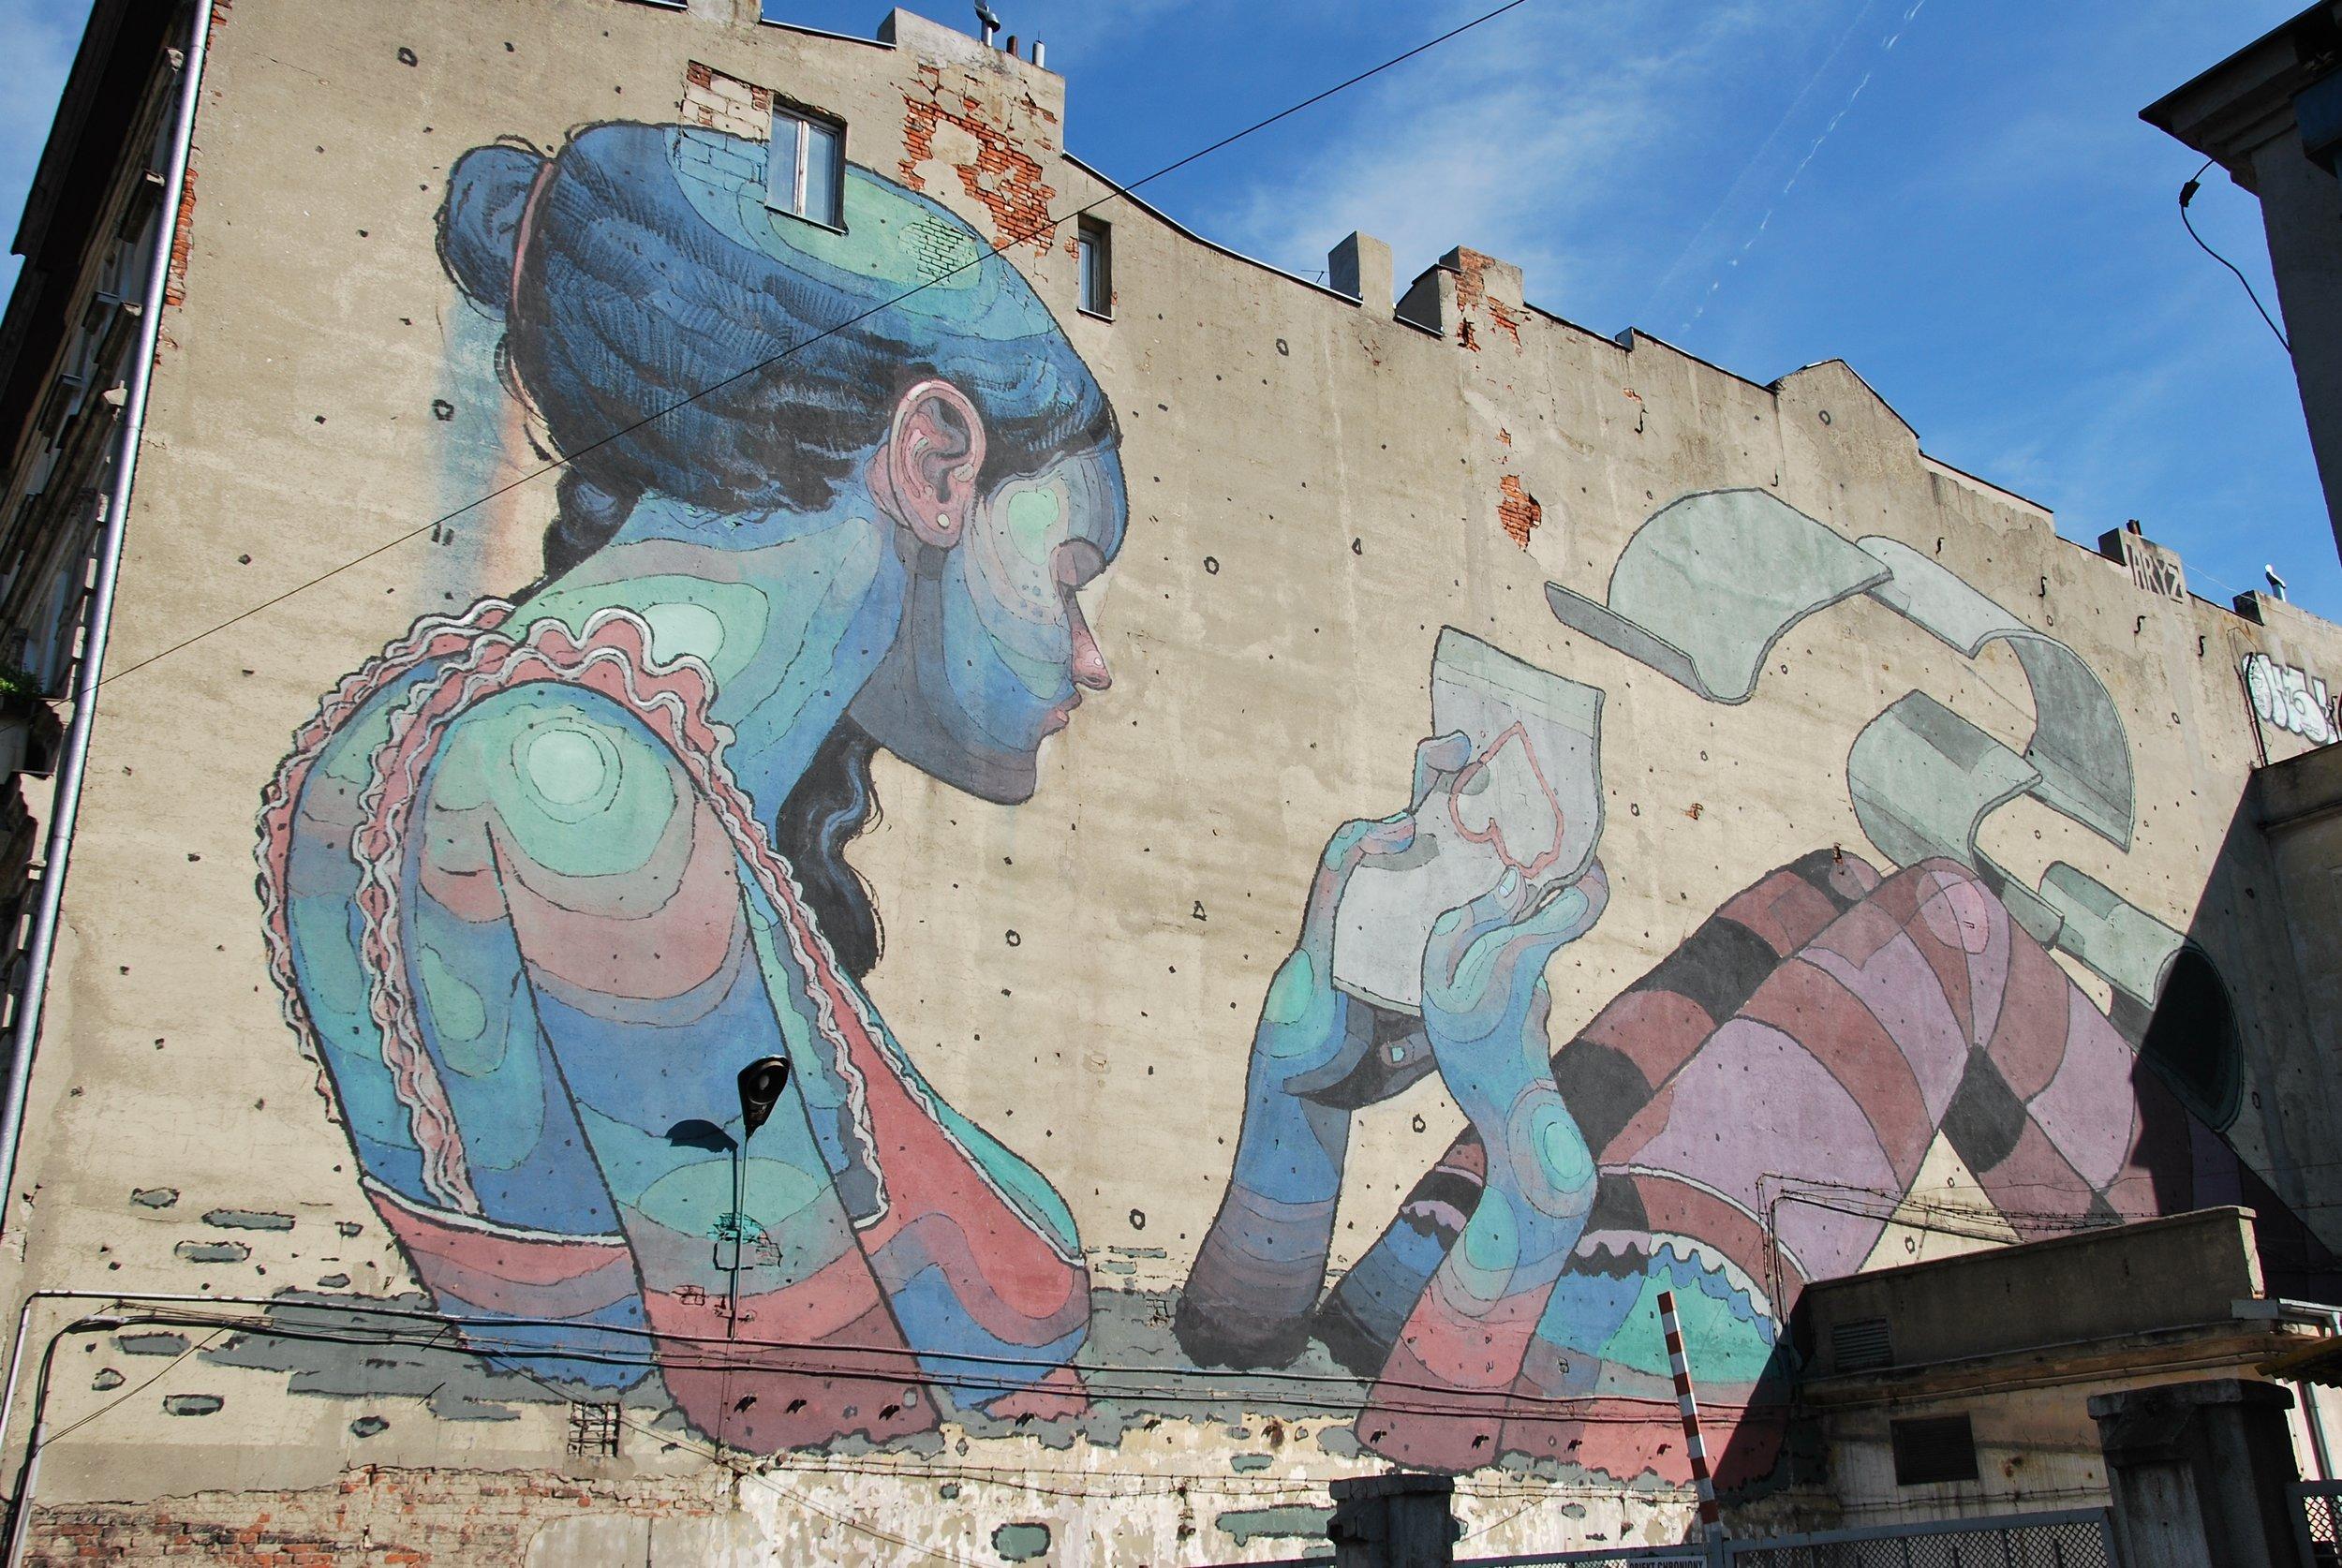 Mural_of_Aryz_(Spain)_Łódź_67_Pomorska_Street.jpg